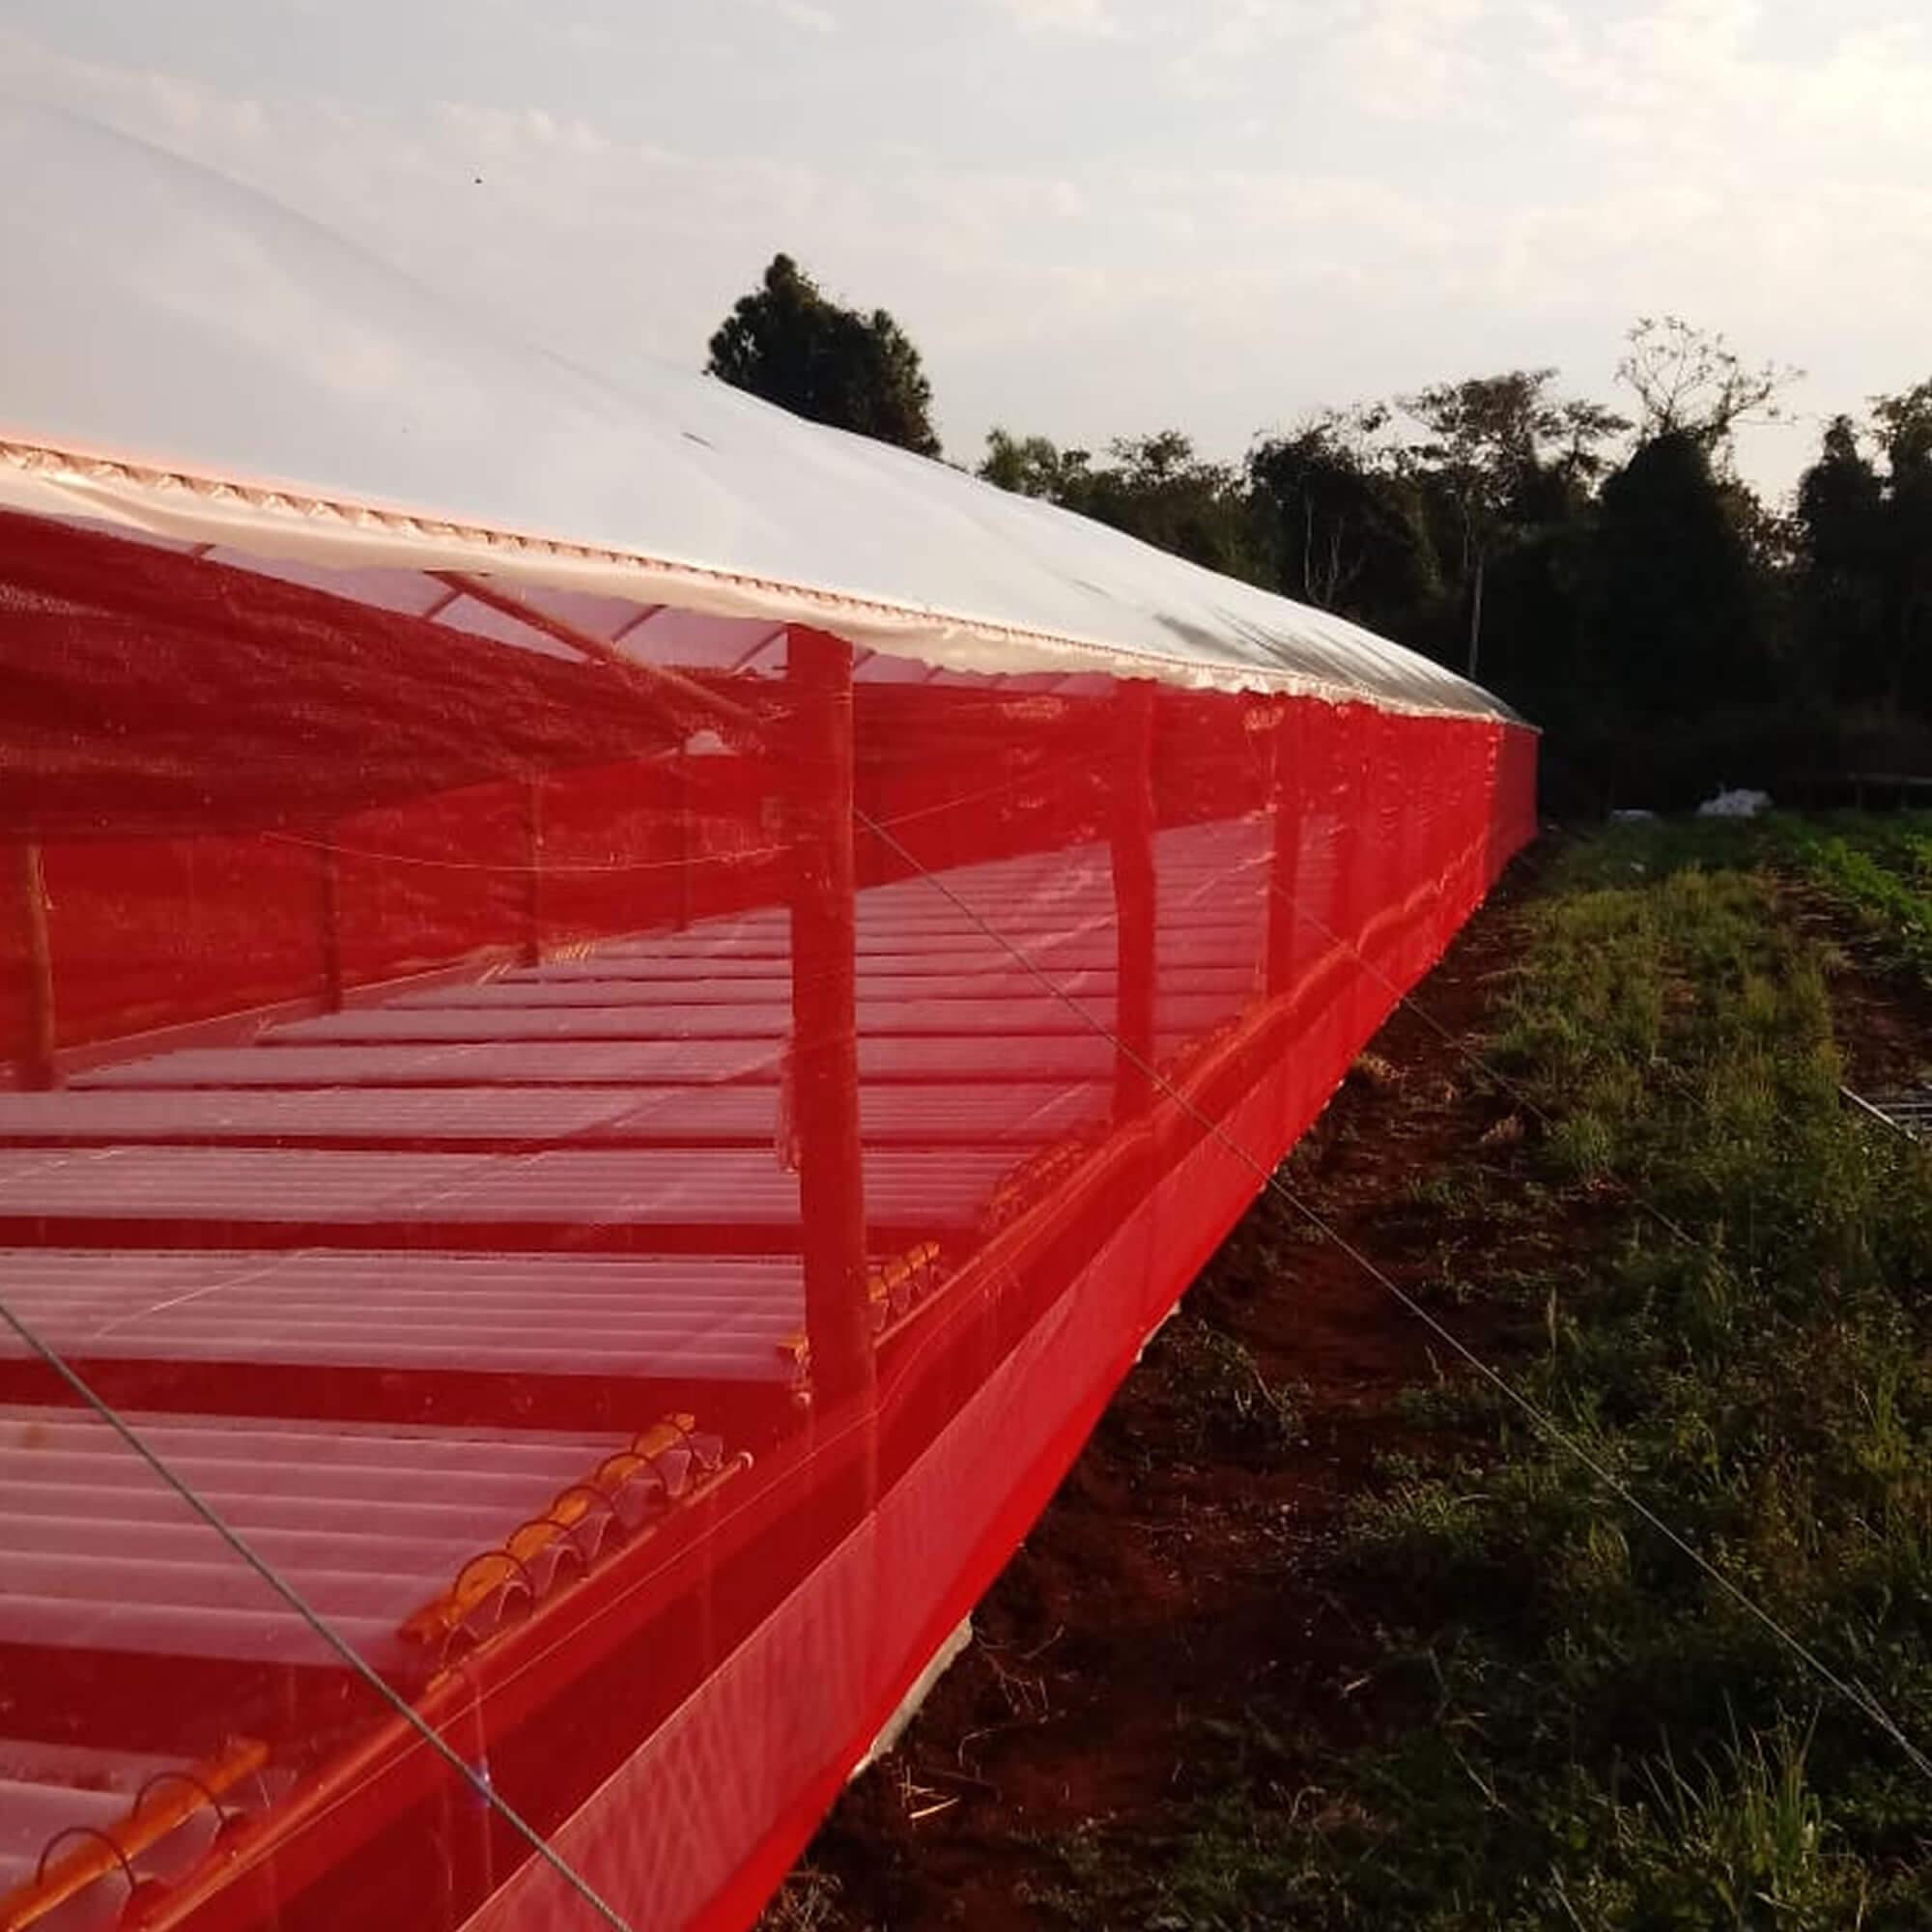 Tela de Sombreamento Vermelha 20% - 3 x 10 metros